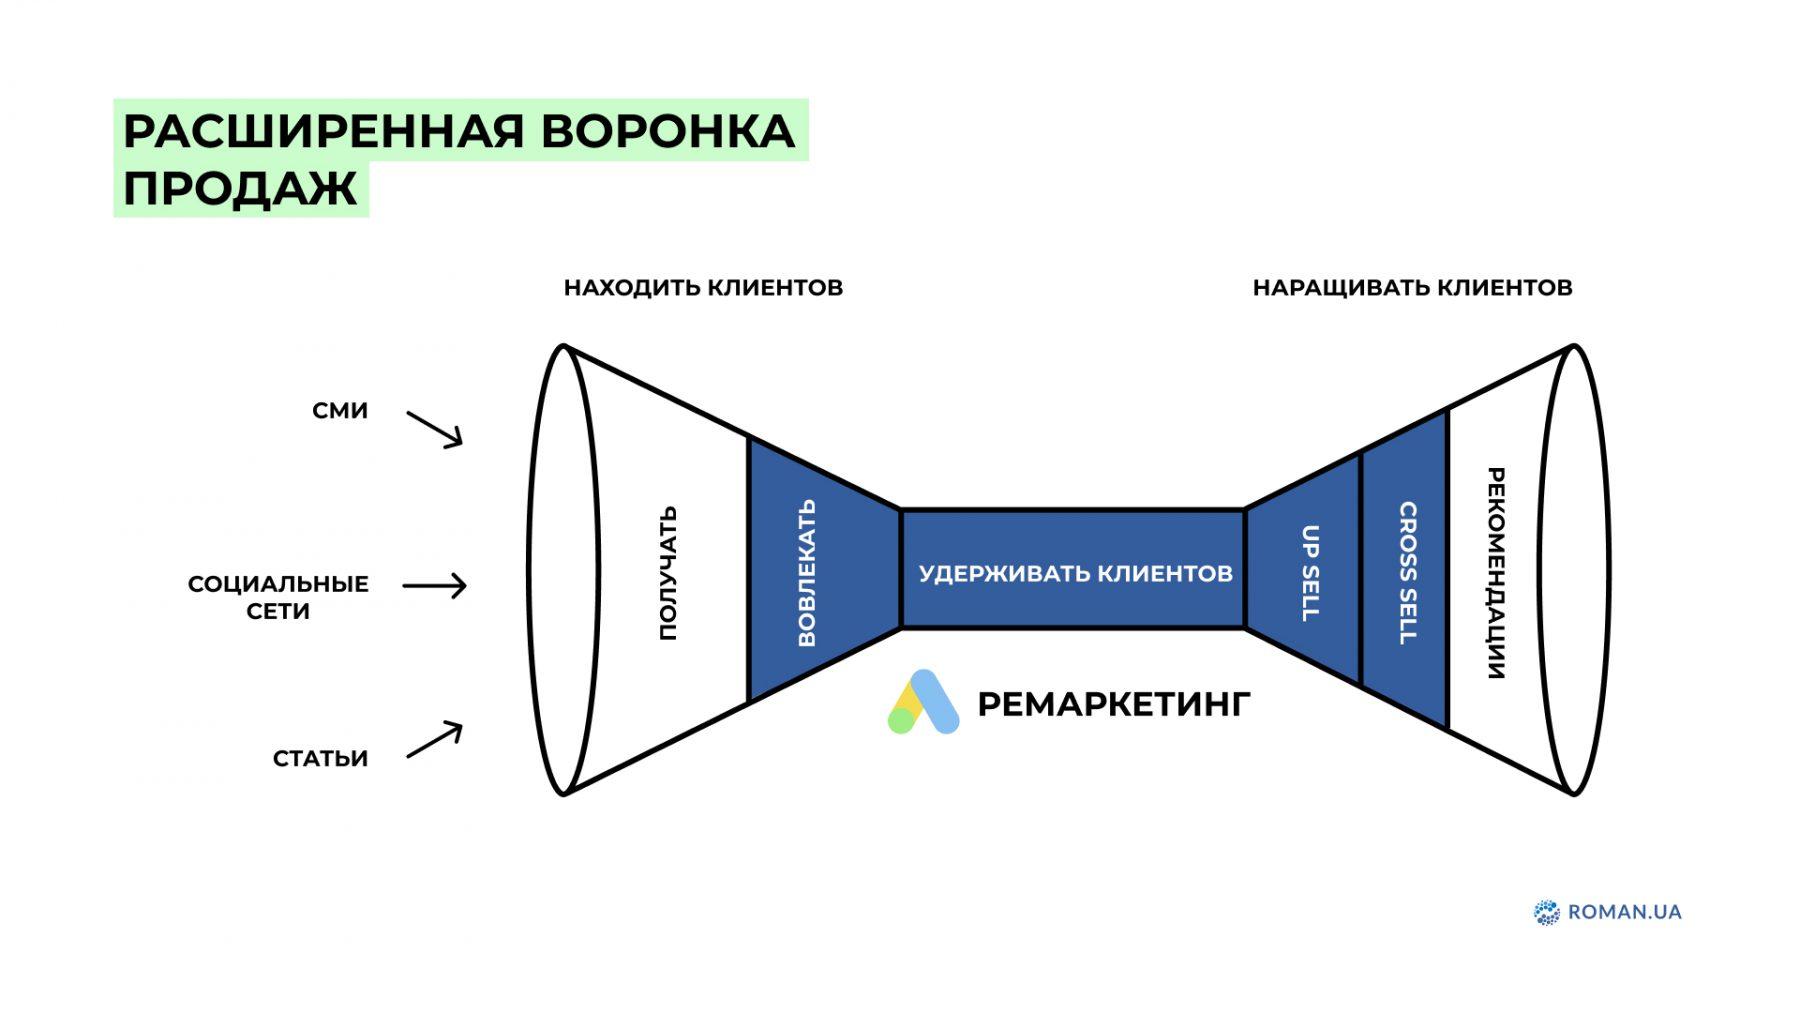 remarketing-4-1800x1013.jpg